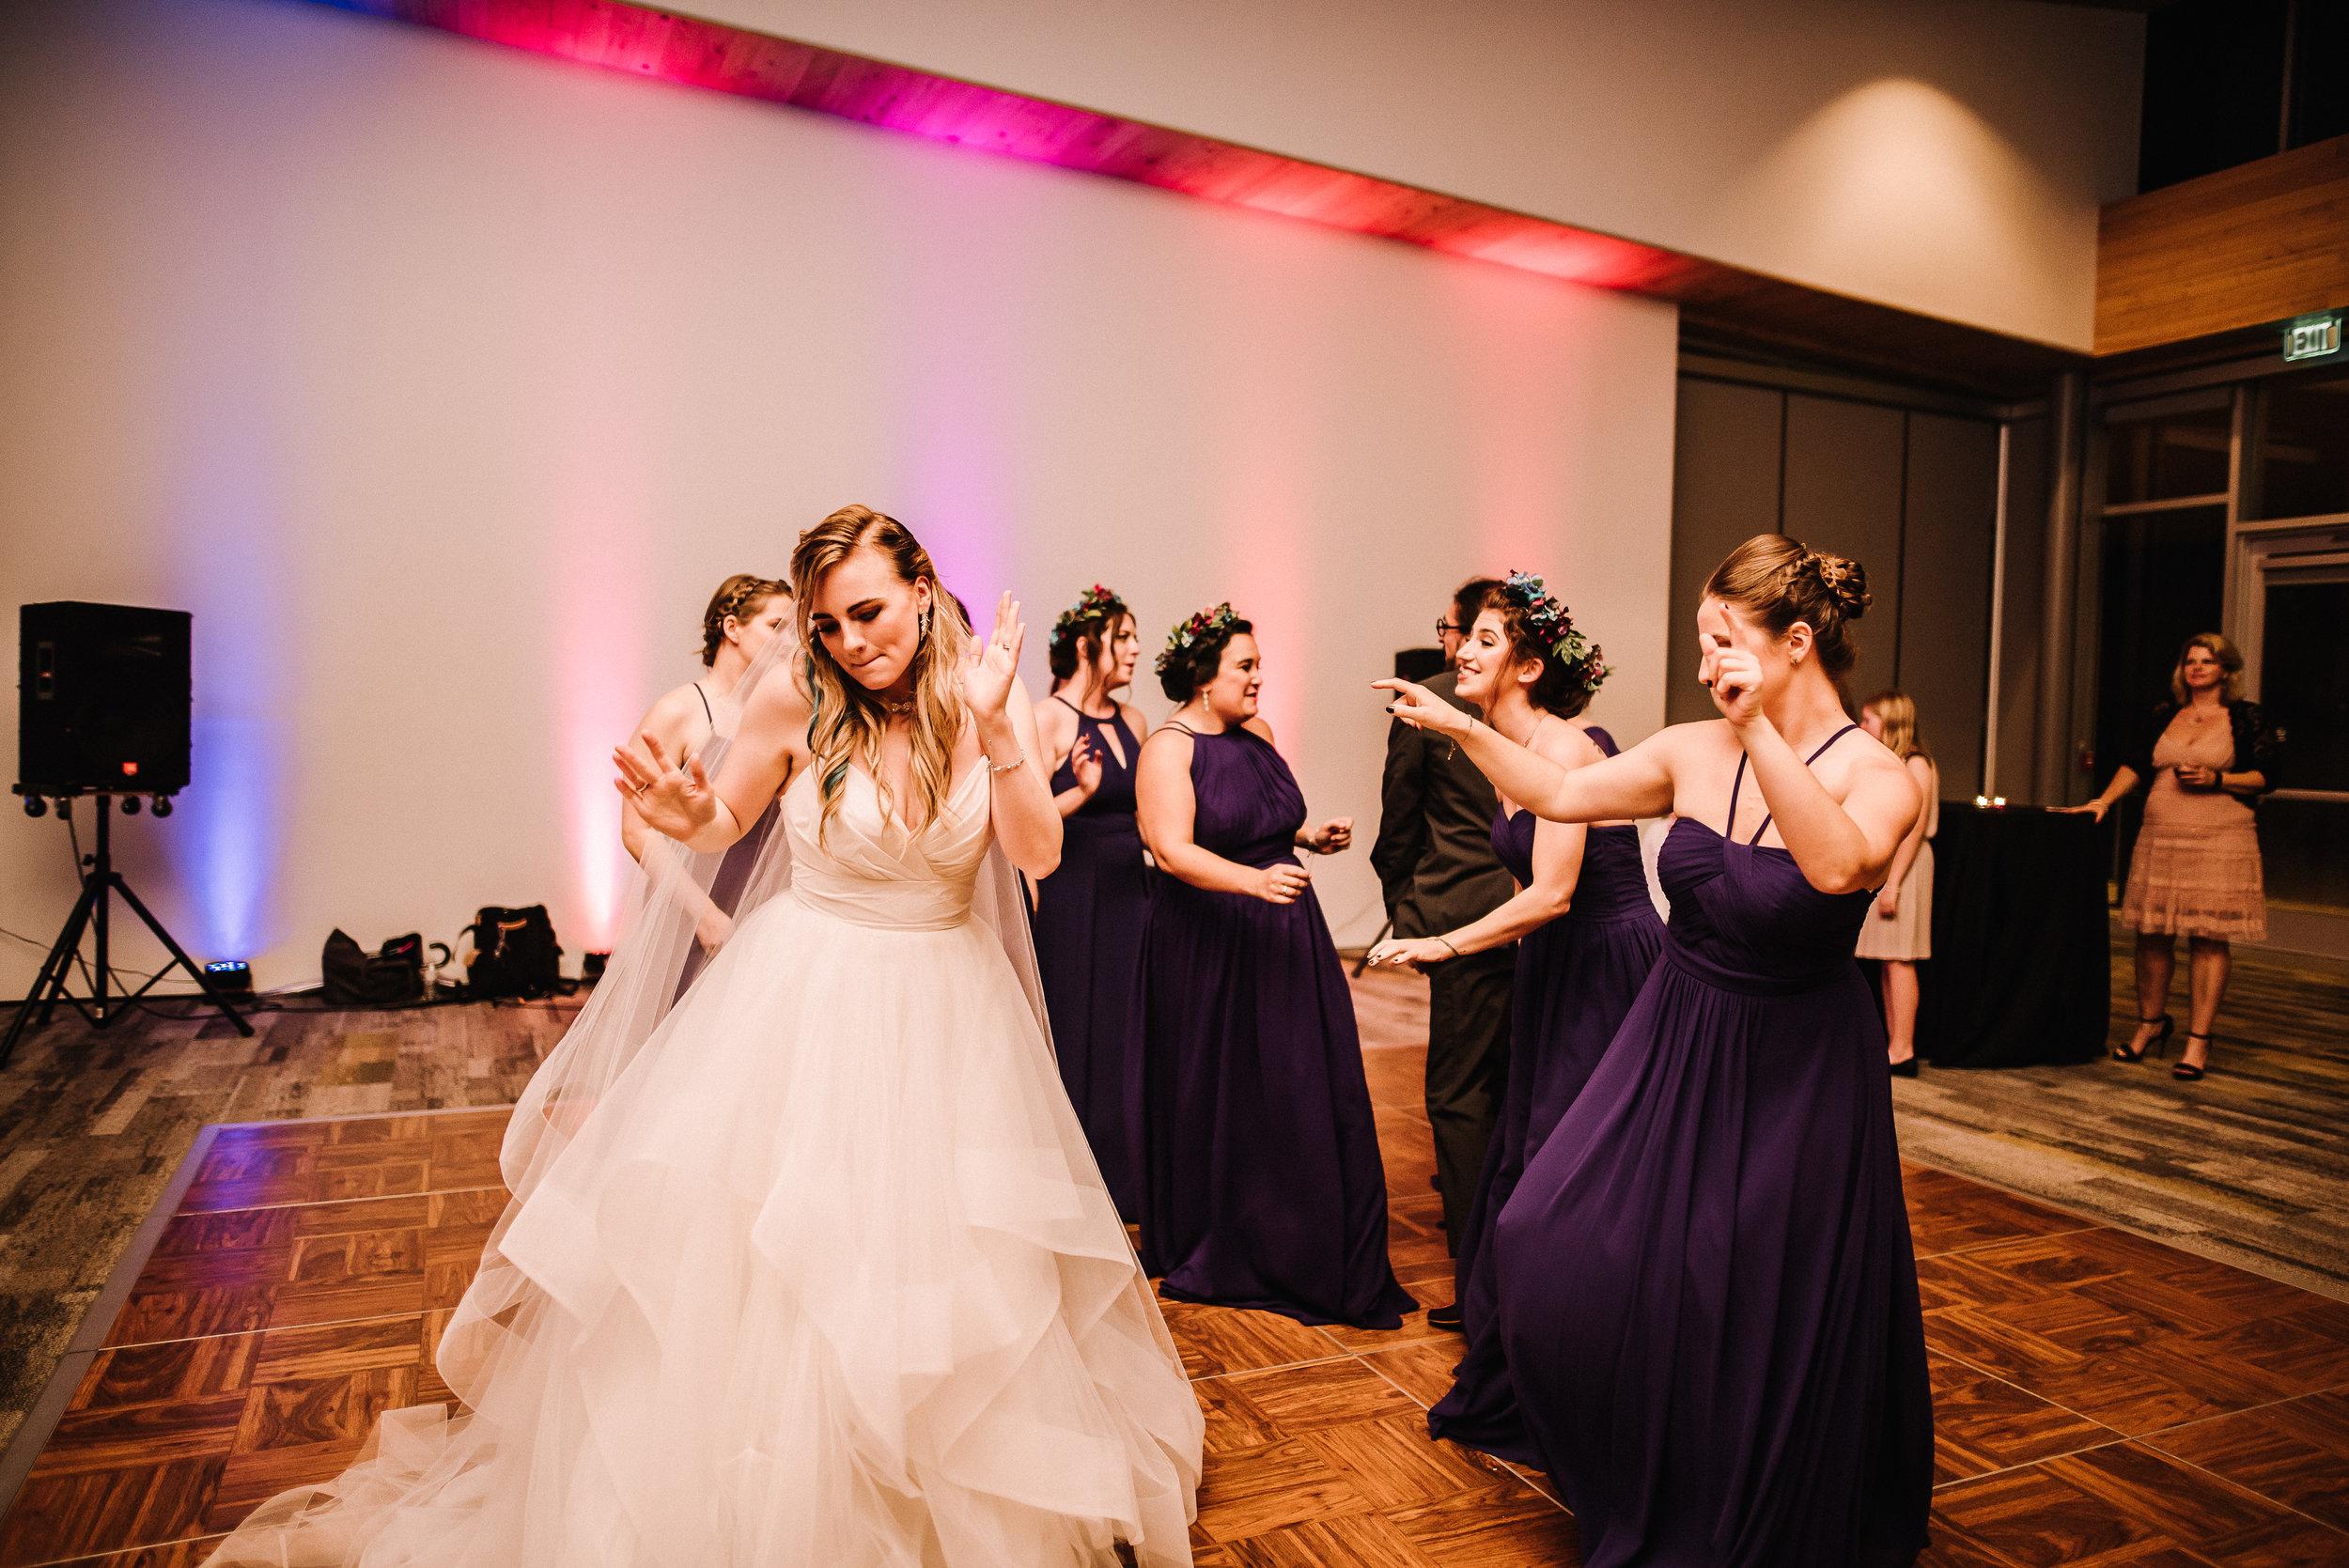 Lucchesi-Wedding_Shelby-Farms_Ashley-Benham-Photography-872.jpg